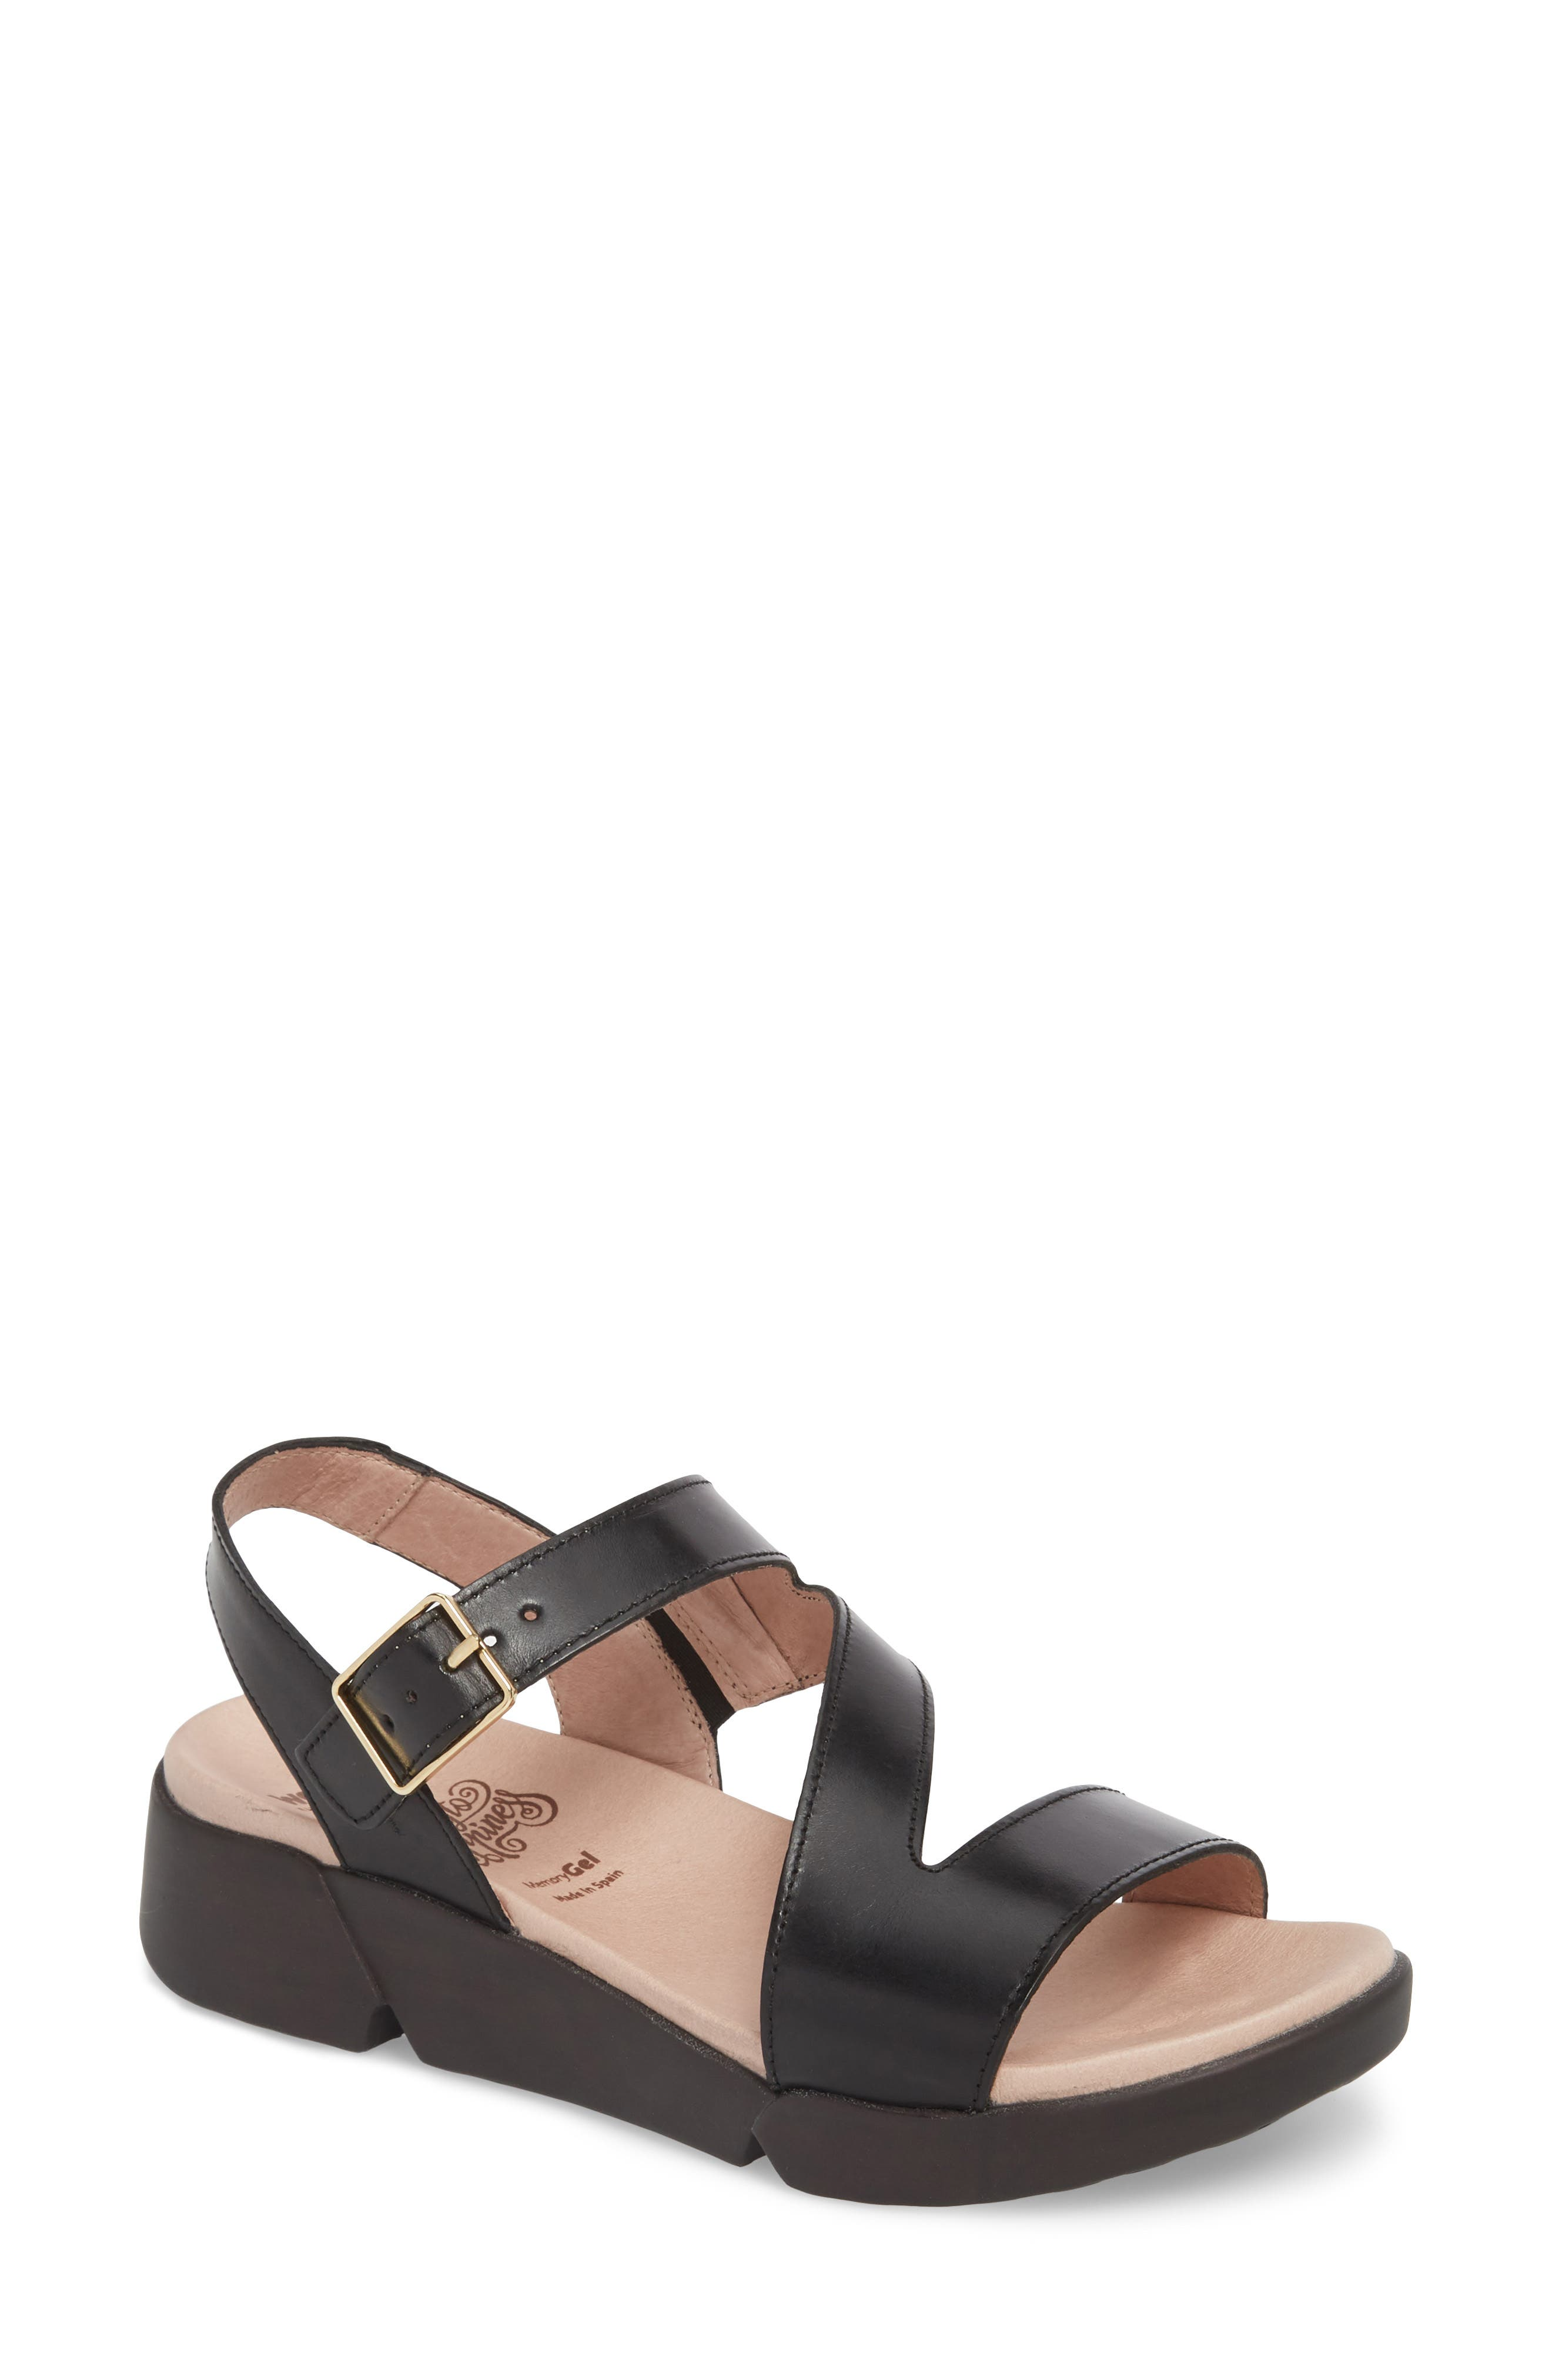 Platform Wedge Sandal,                             Main thumbnail 1, color,                             Black Leather